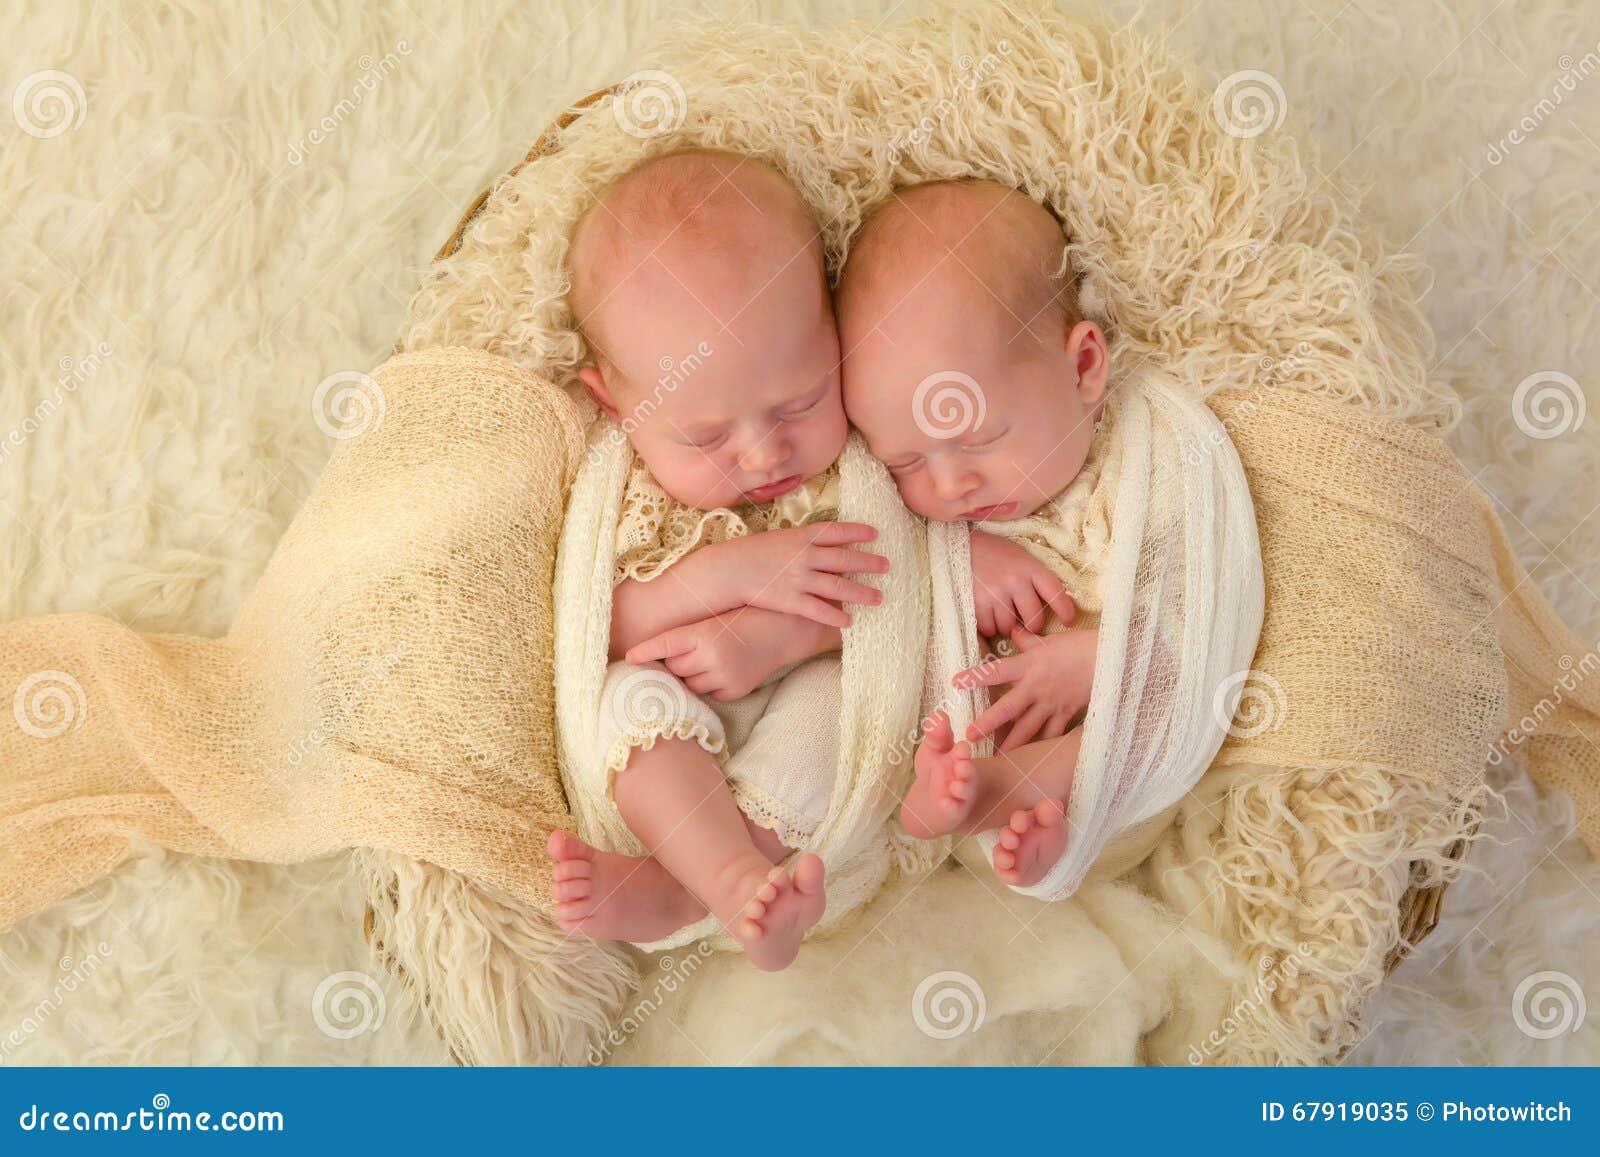 Identical Newborn Twins Stock Photo - Image: 67919035